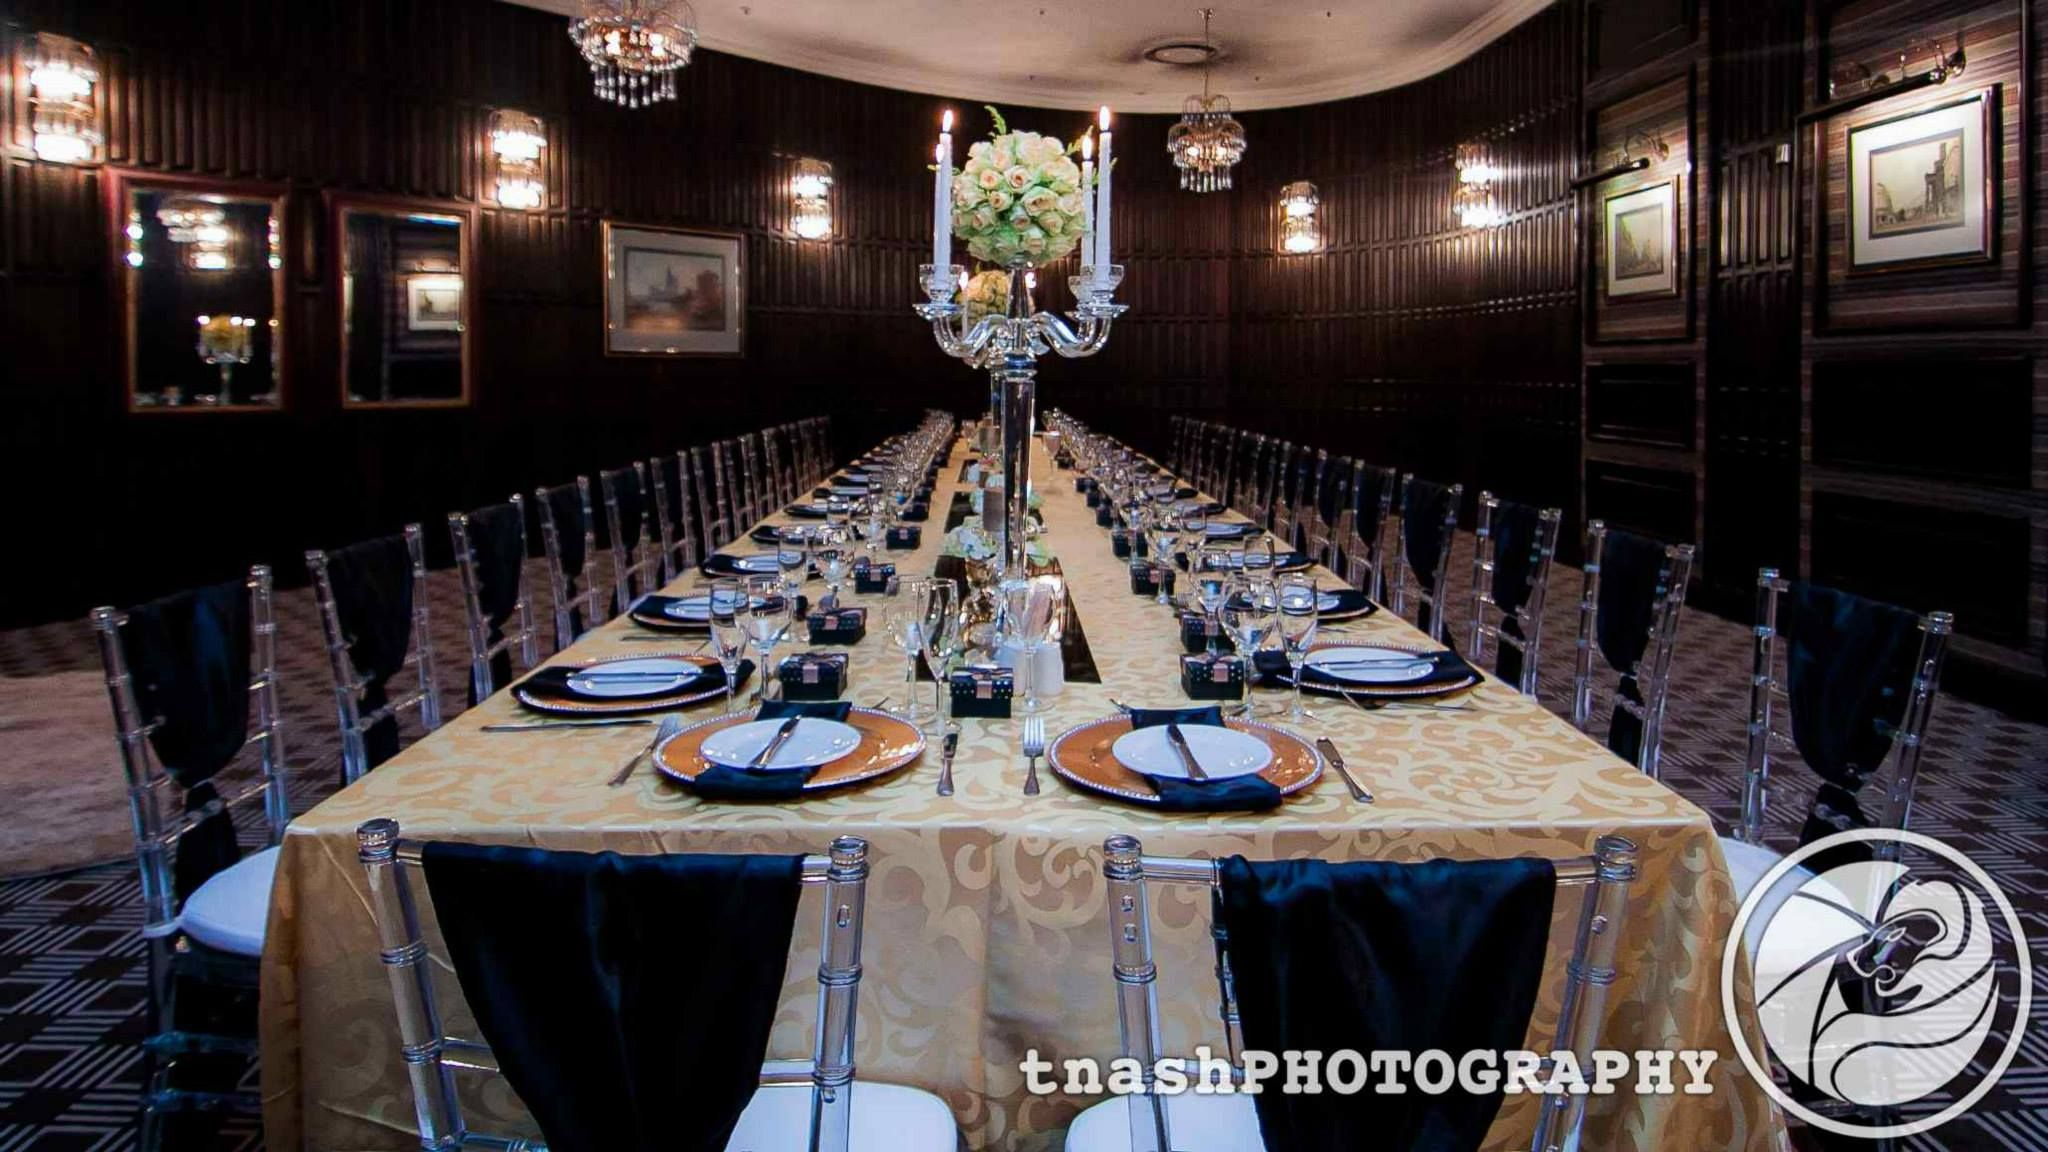 30th birthday dinner set-up. theme was black & gold elegance